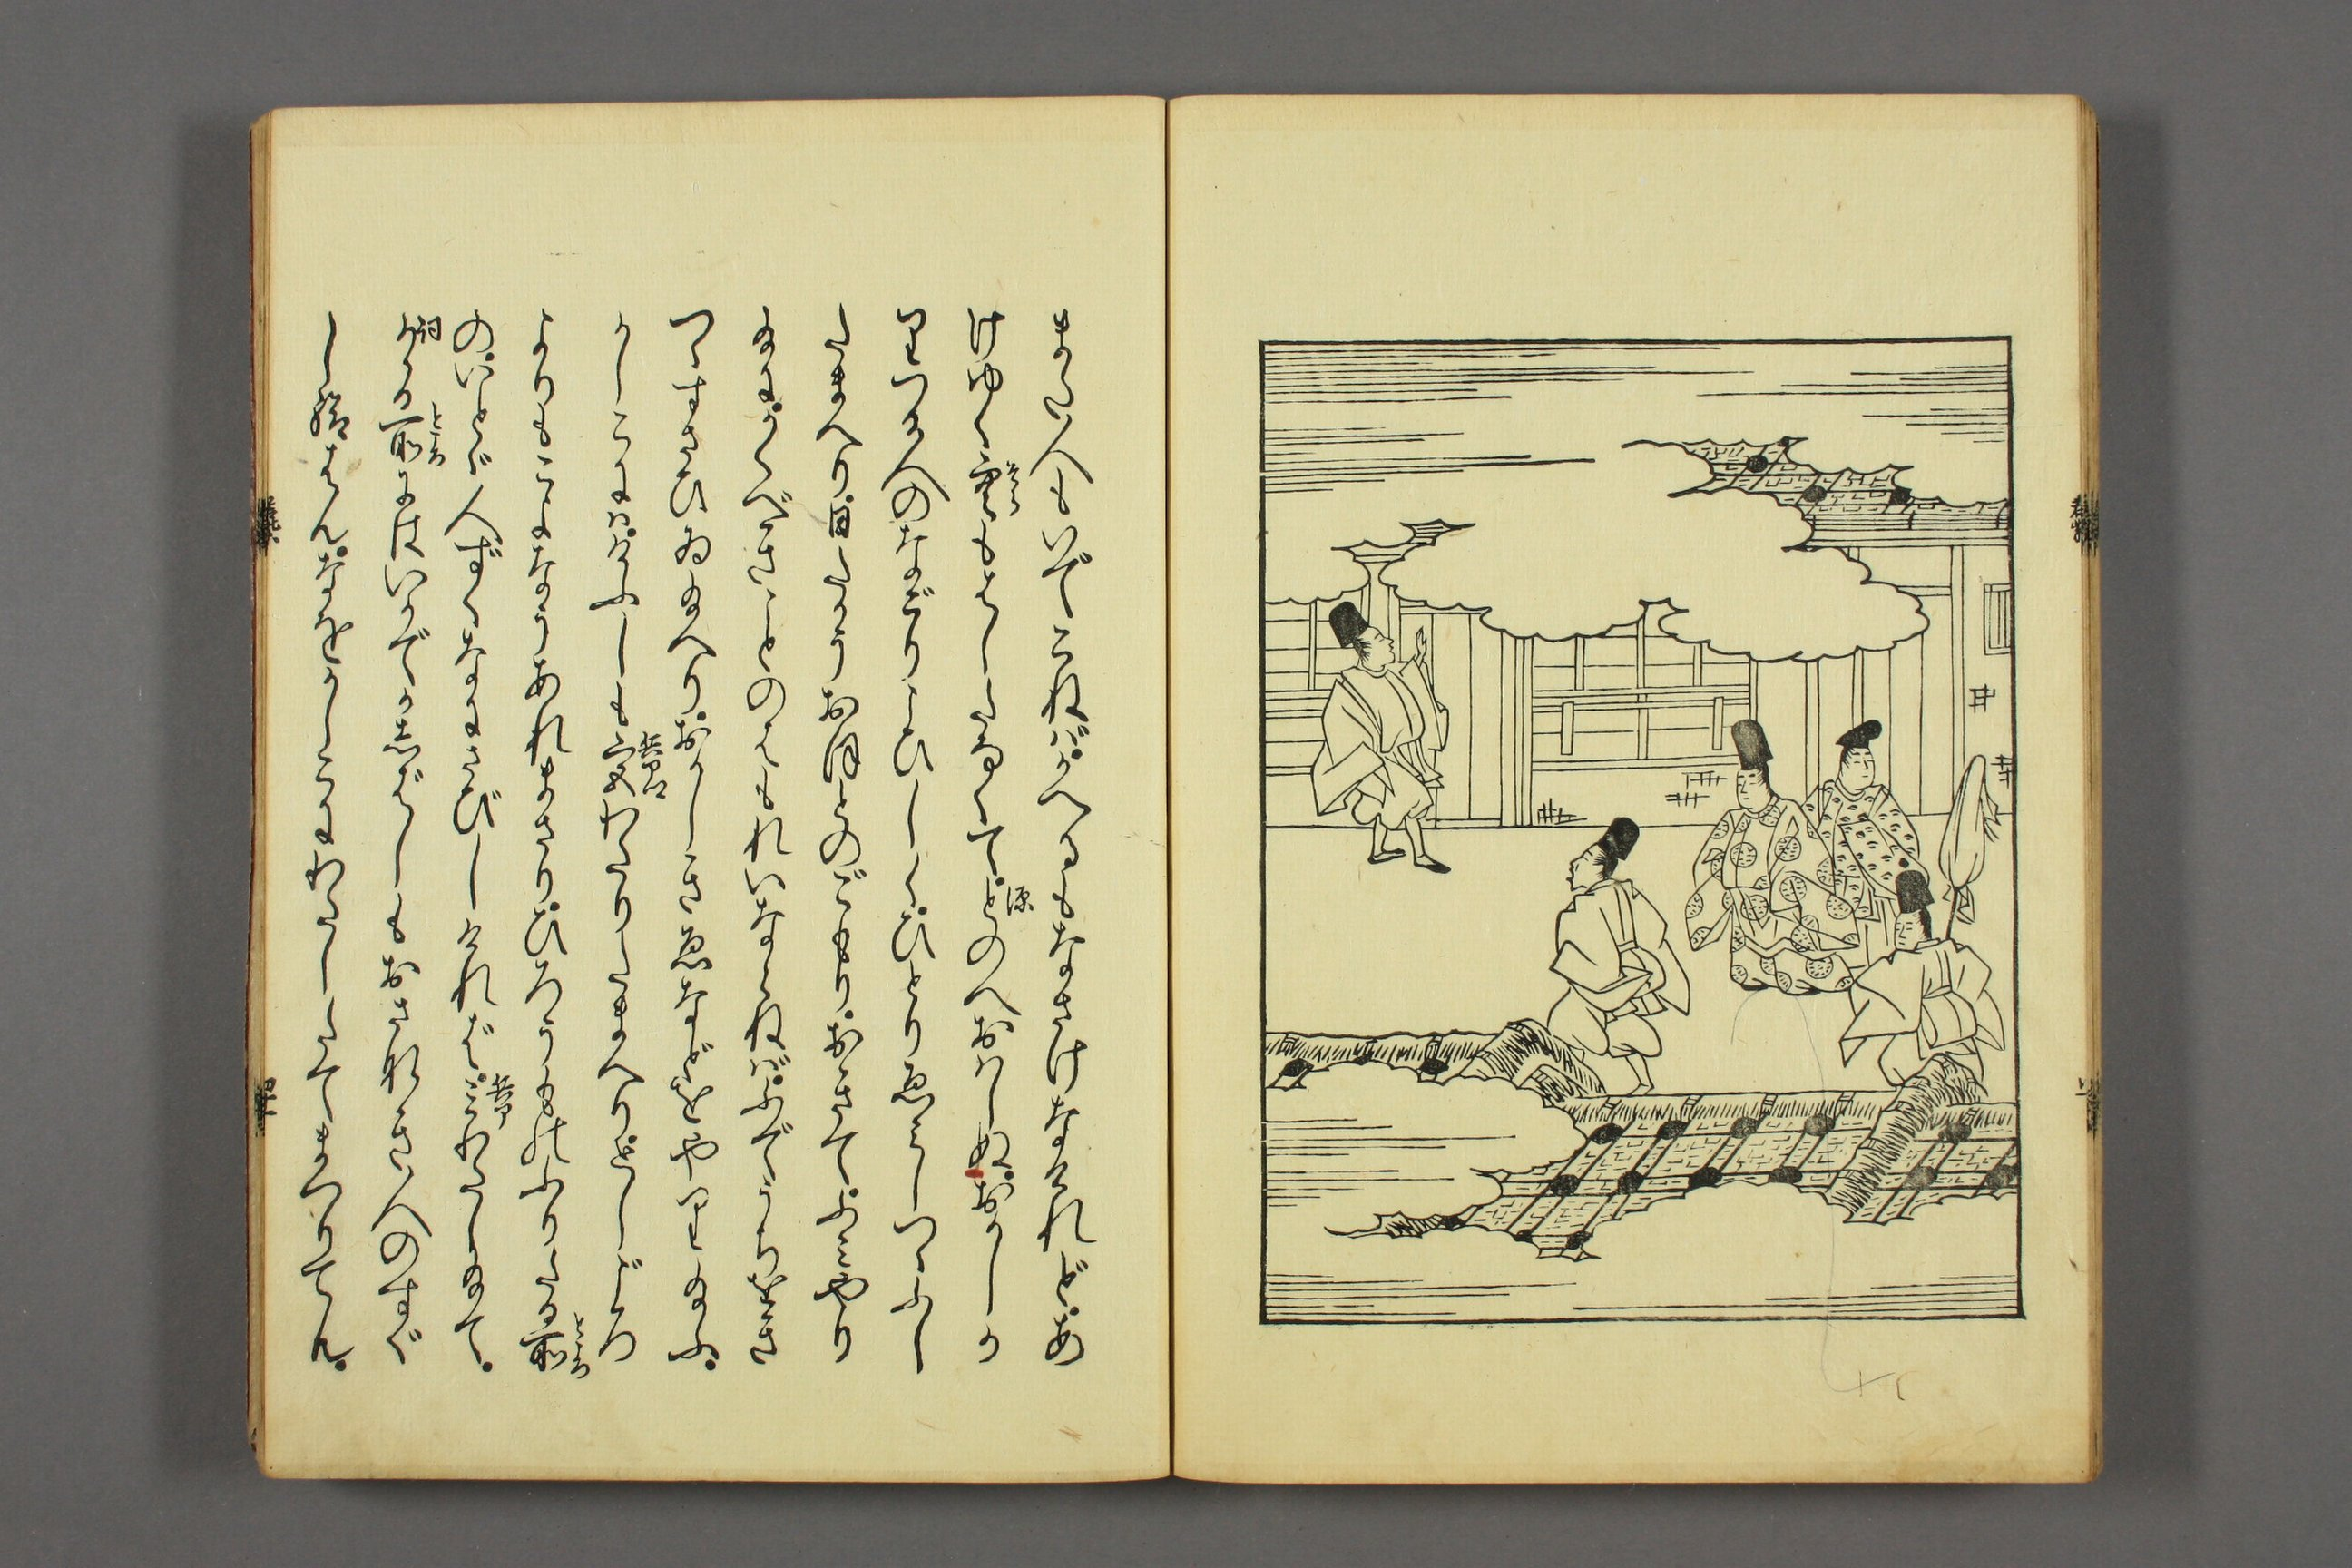 http://archive.wul.waseda.ac.jp/kosho/bunko30/bunko30_a0007/bunko30_a0007_0005/bunko30_a0007_0005_p0042.jpg